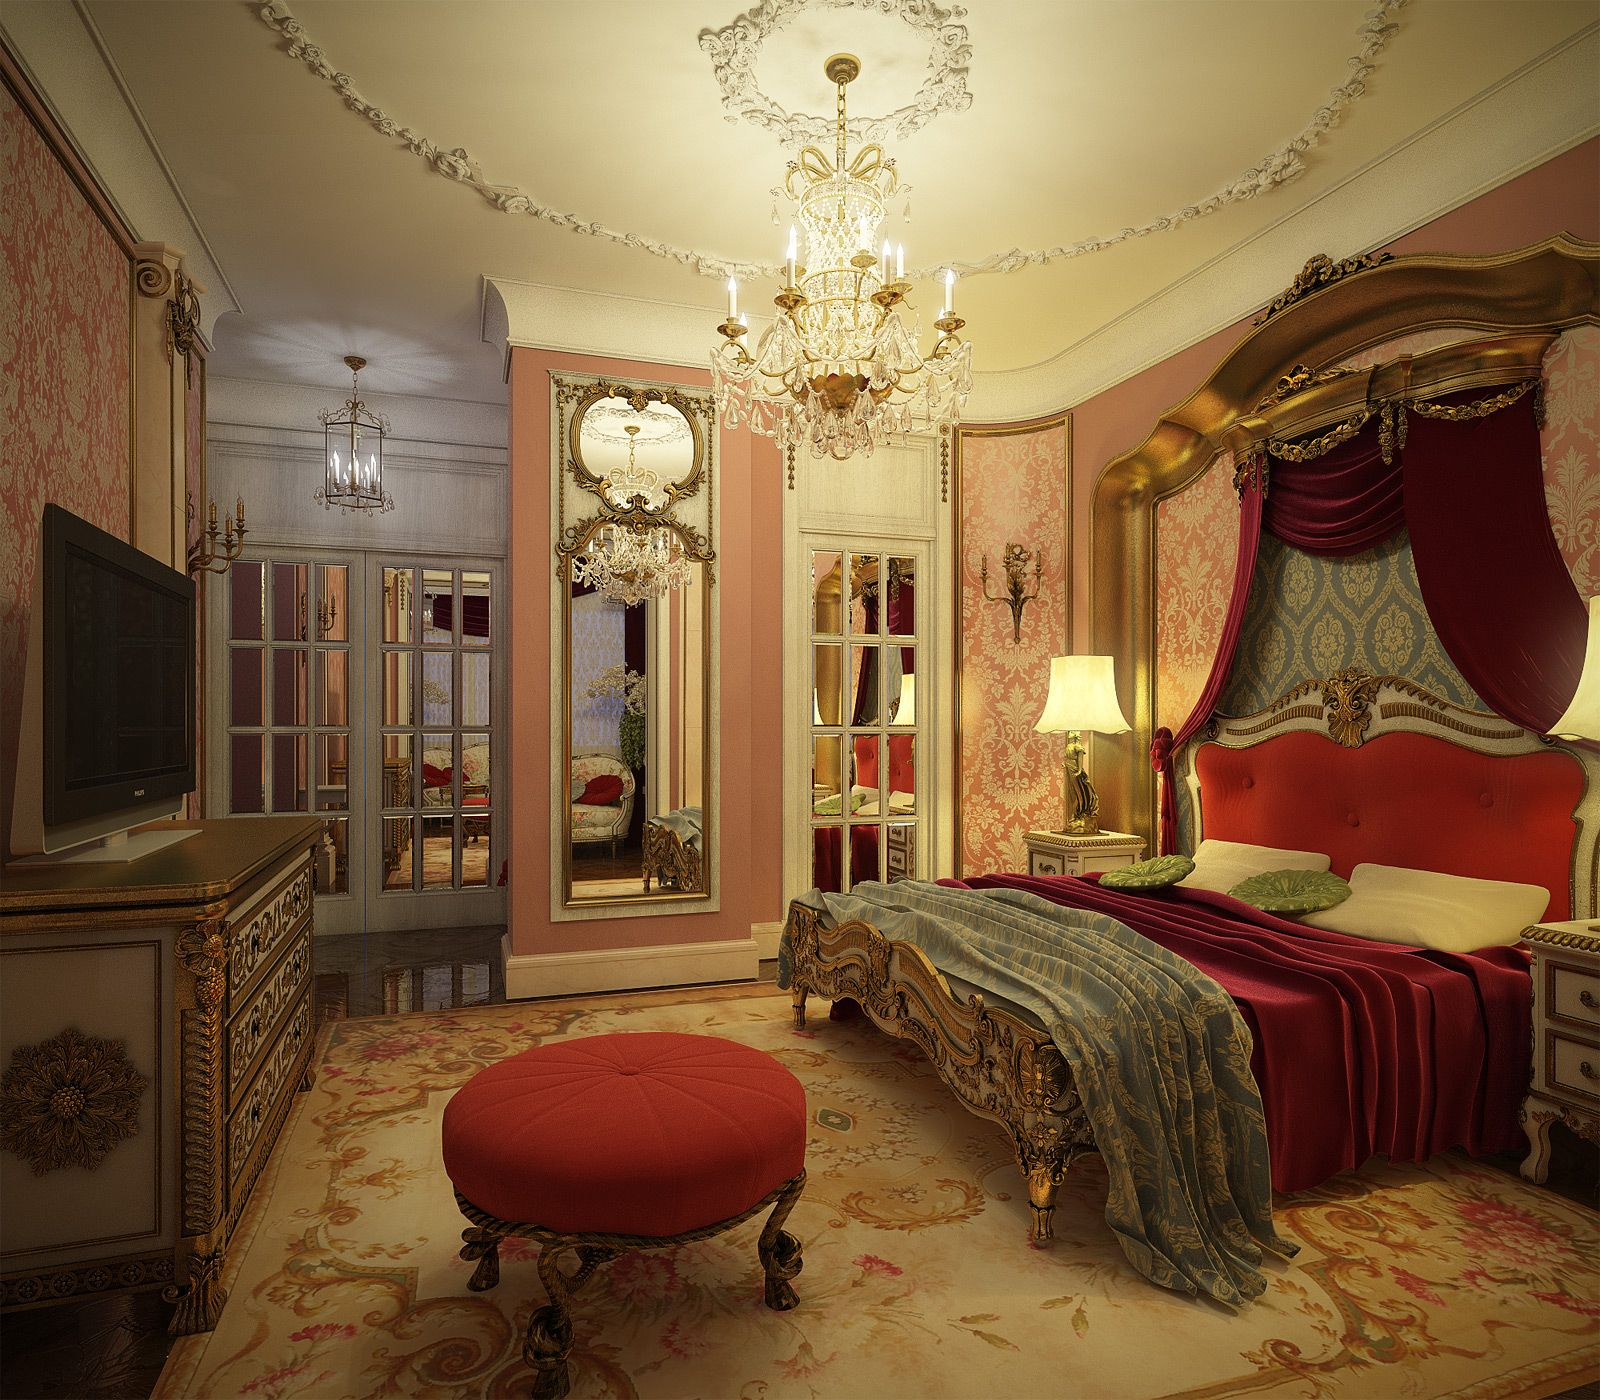 The Most Amazing Bedroom I Have Ever Seen Opulent Bedroom